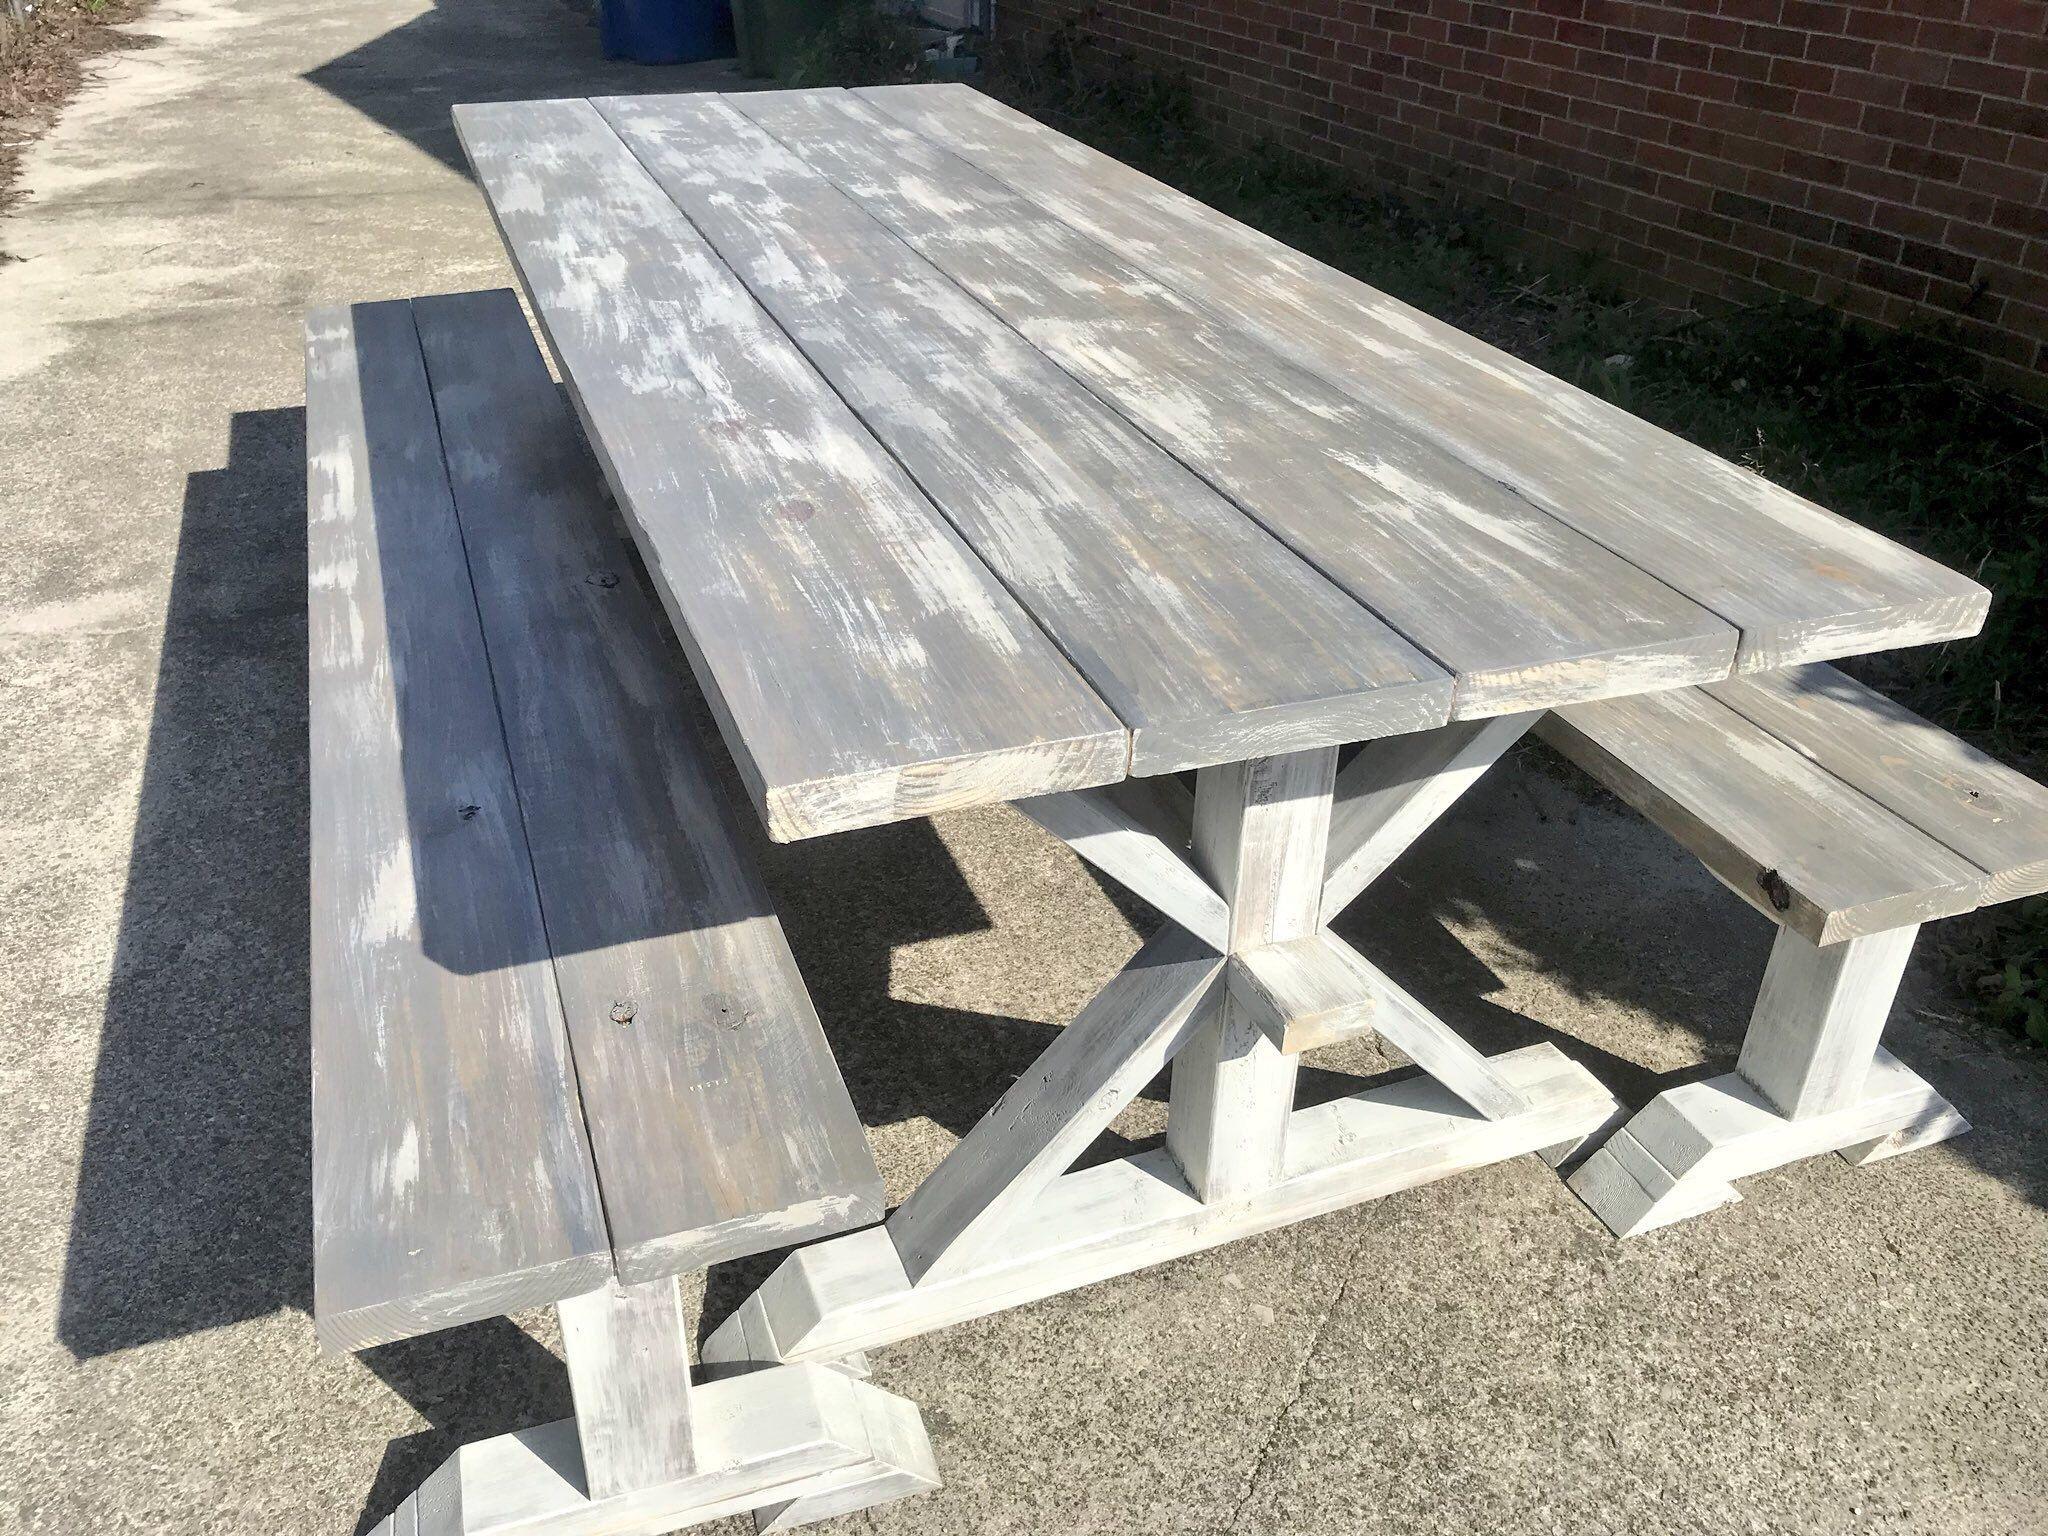 Sensational 8Ft Rustic Farmhouse Table With Long Benches Banquet Table Inzonedesignstudio Interior Chair Design Inzonedesignstudiocom